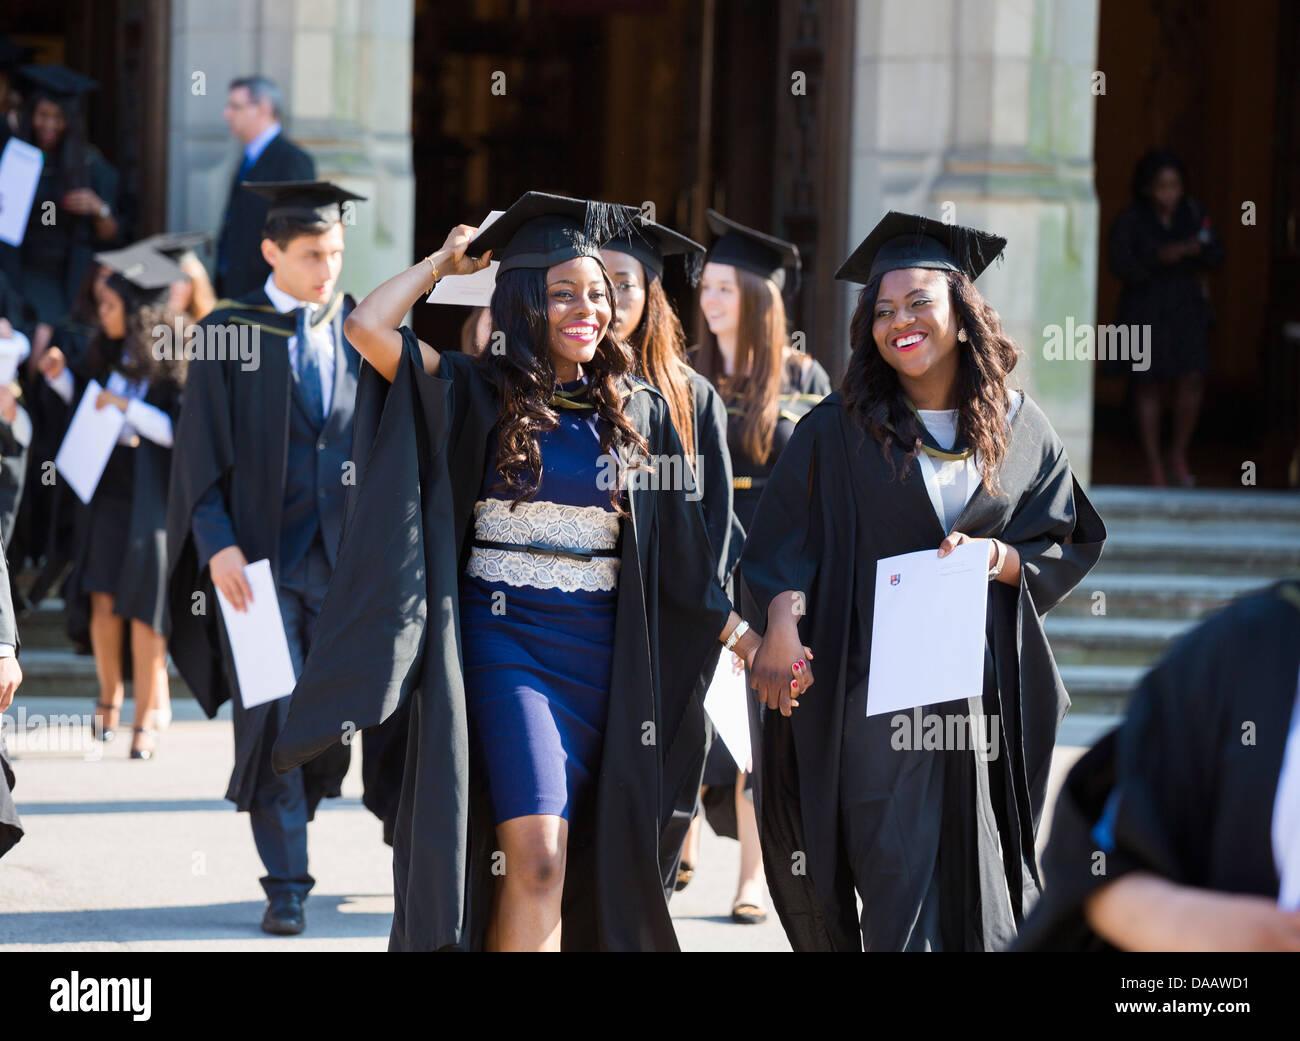 Birmingham Graduation Stock Photos & Birmingham Graduation Stock ...